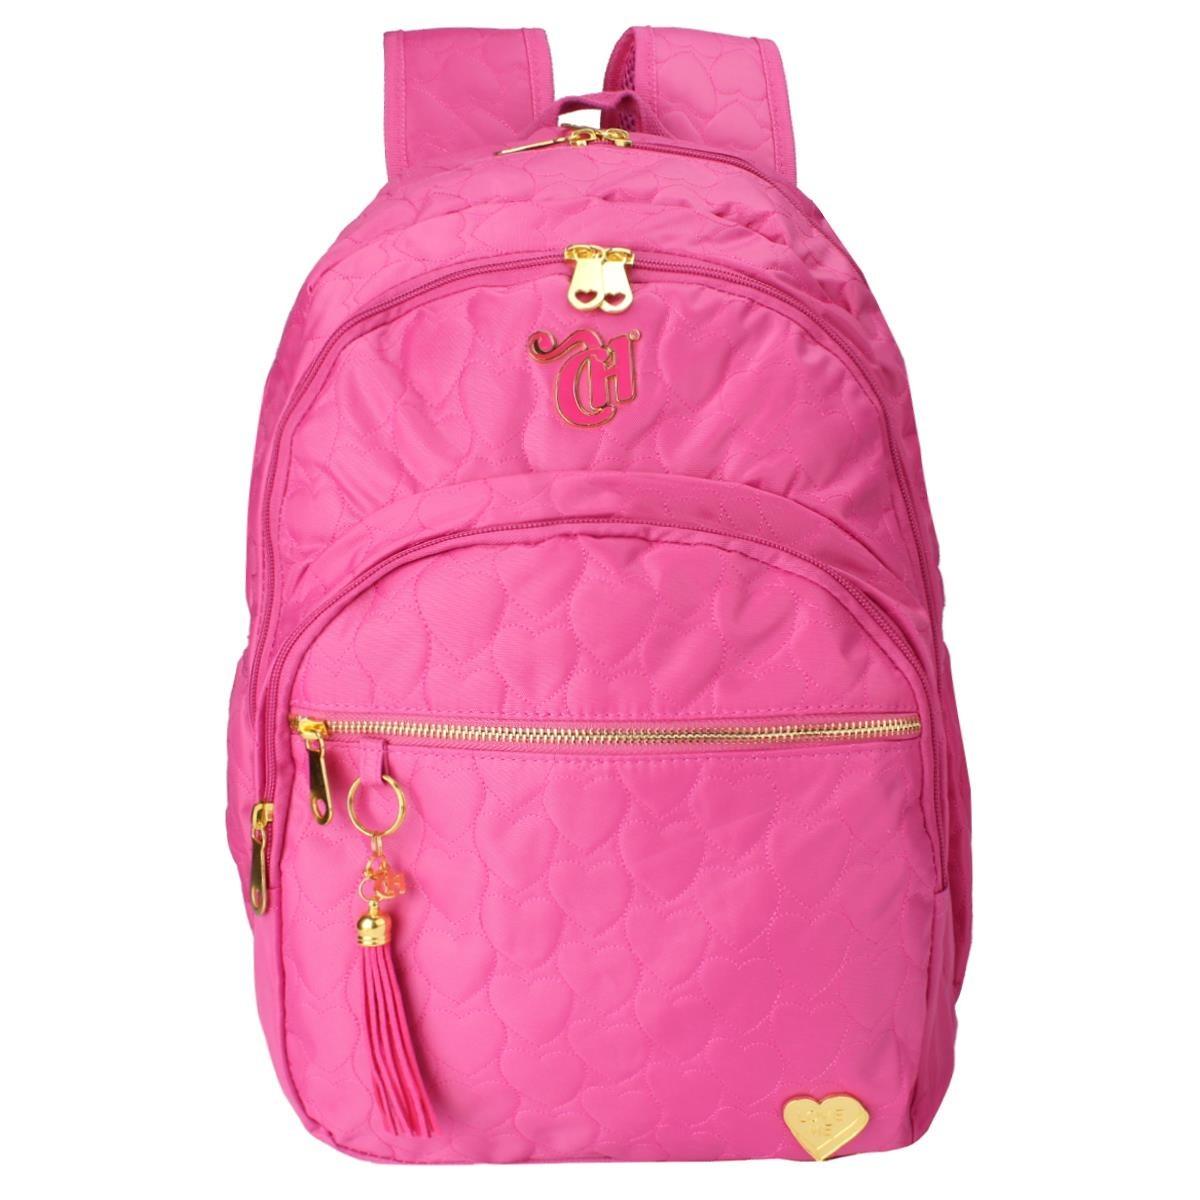 b1b126f91 Mochila Capricho Love Pink, Rosa, G - 10987 - Dmw - R$ 299,99 em ...